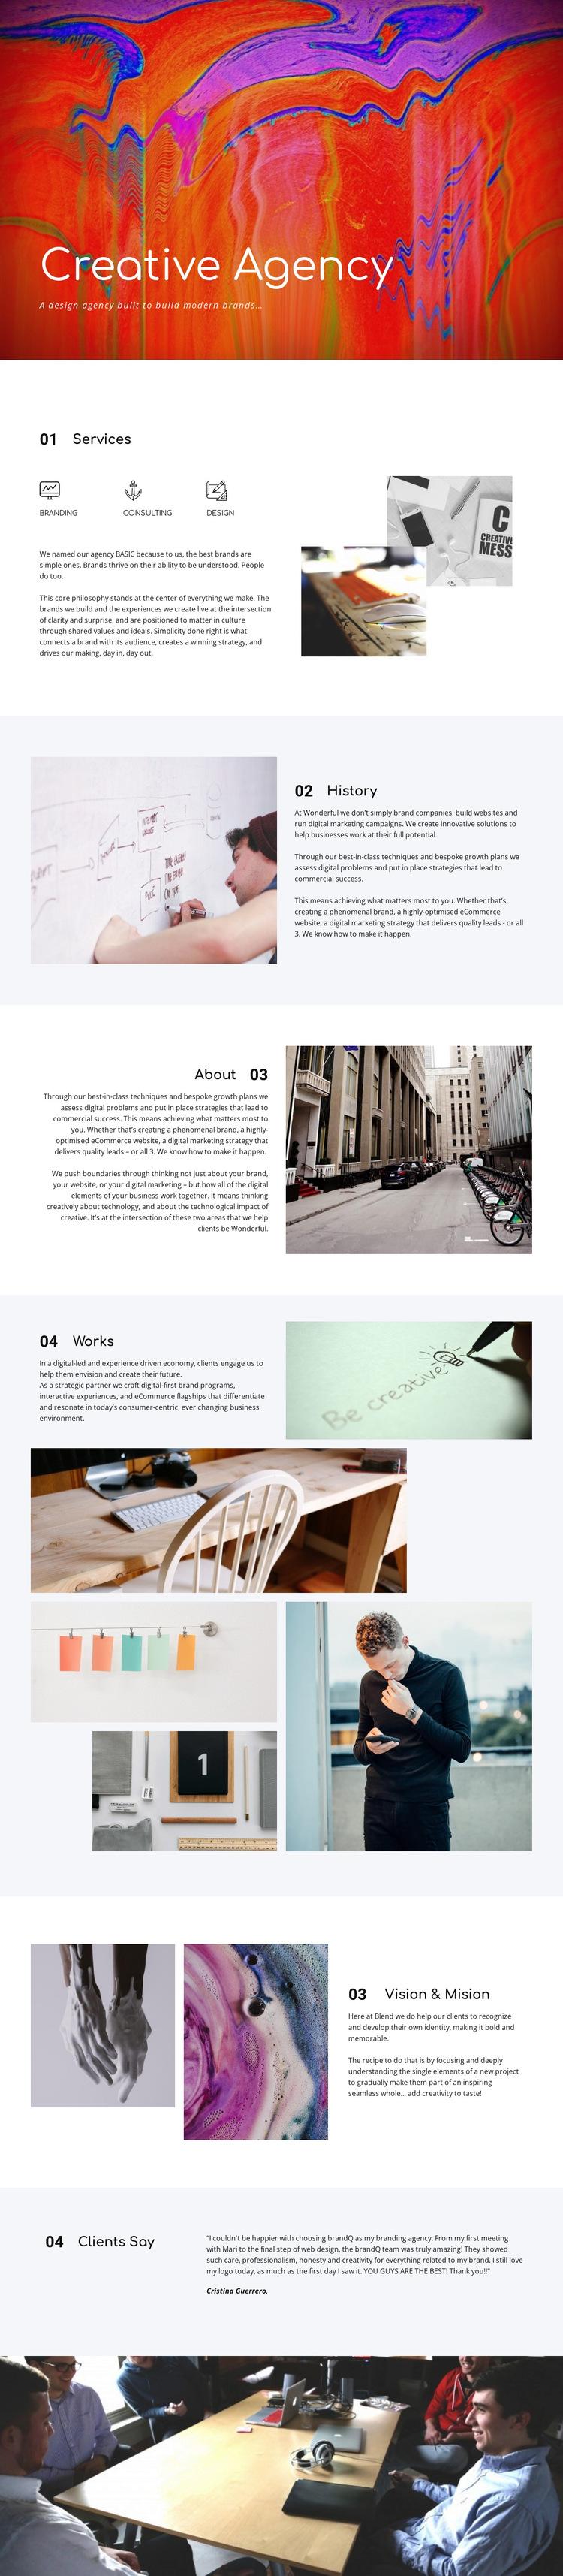 Creative gallery HTML5 Template